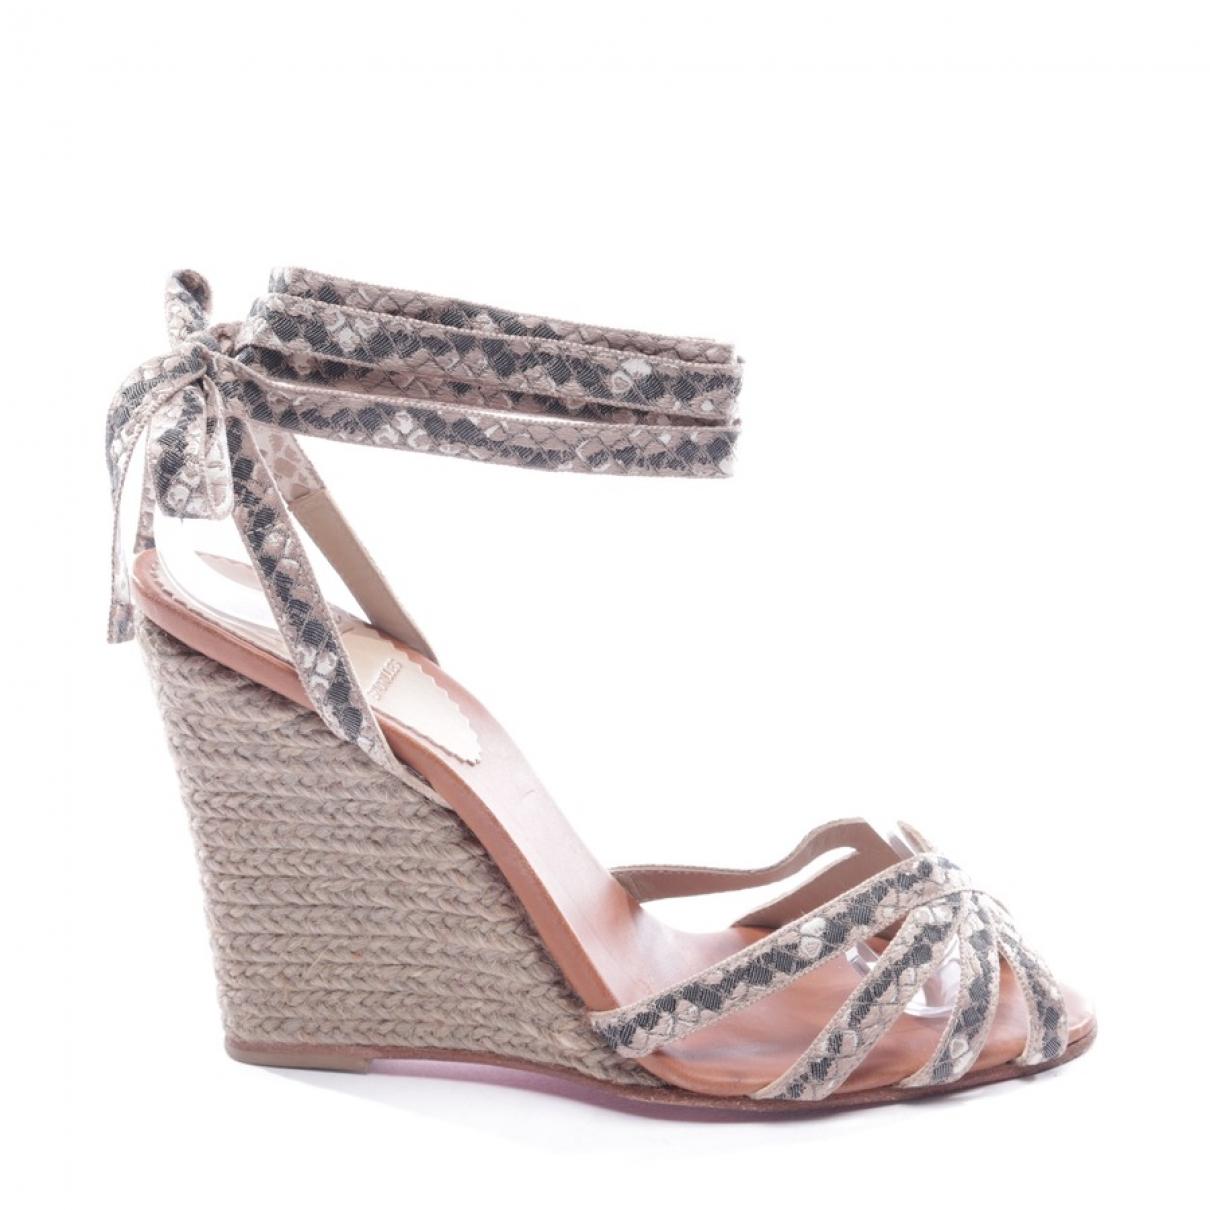 Christian Louboutin \N Grey Cloth Sandals for Women 36 EU